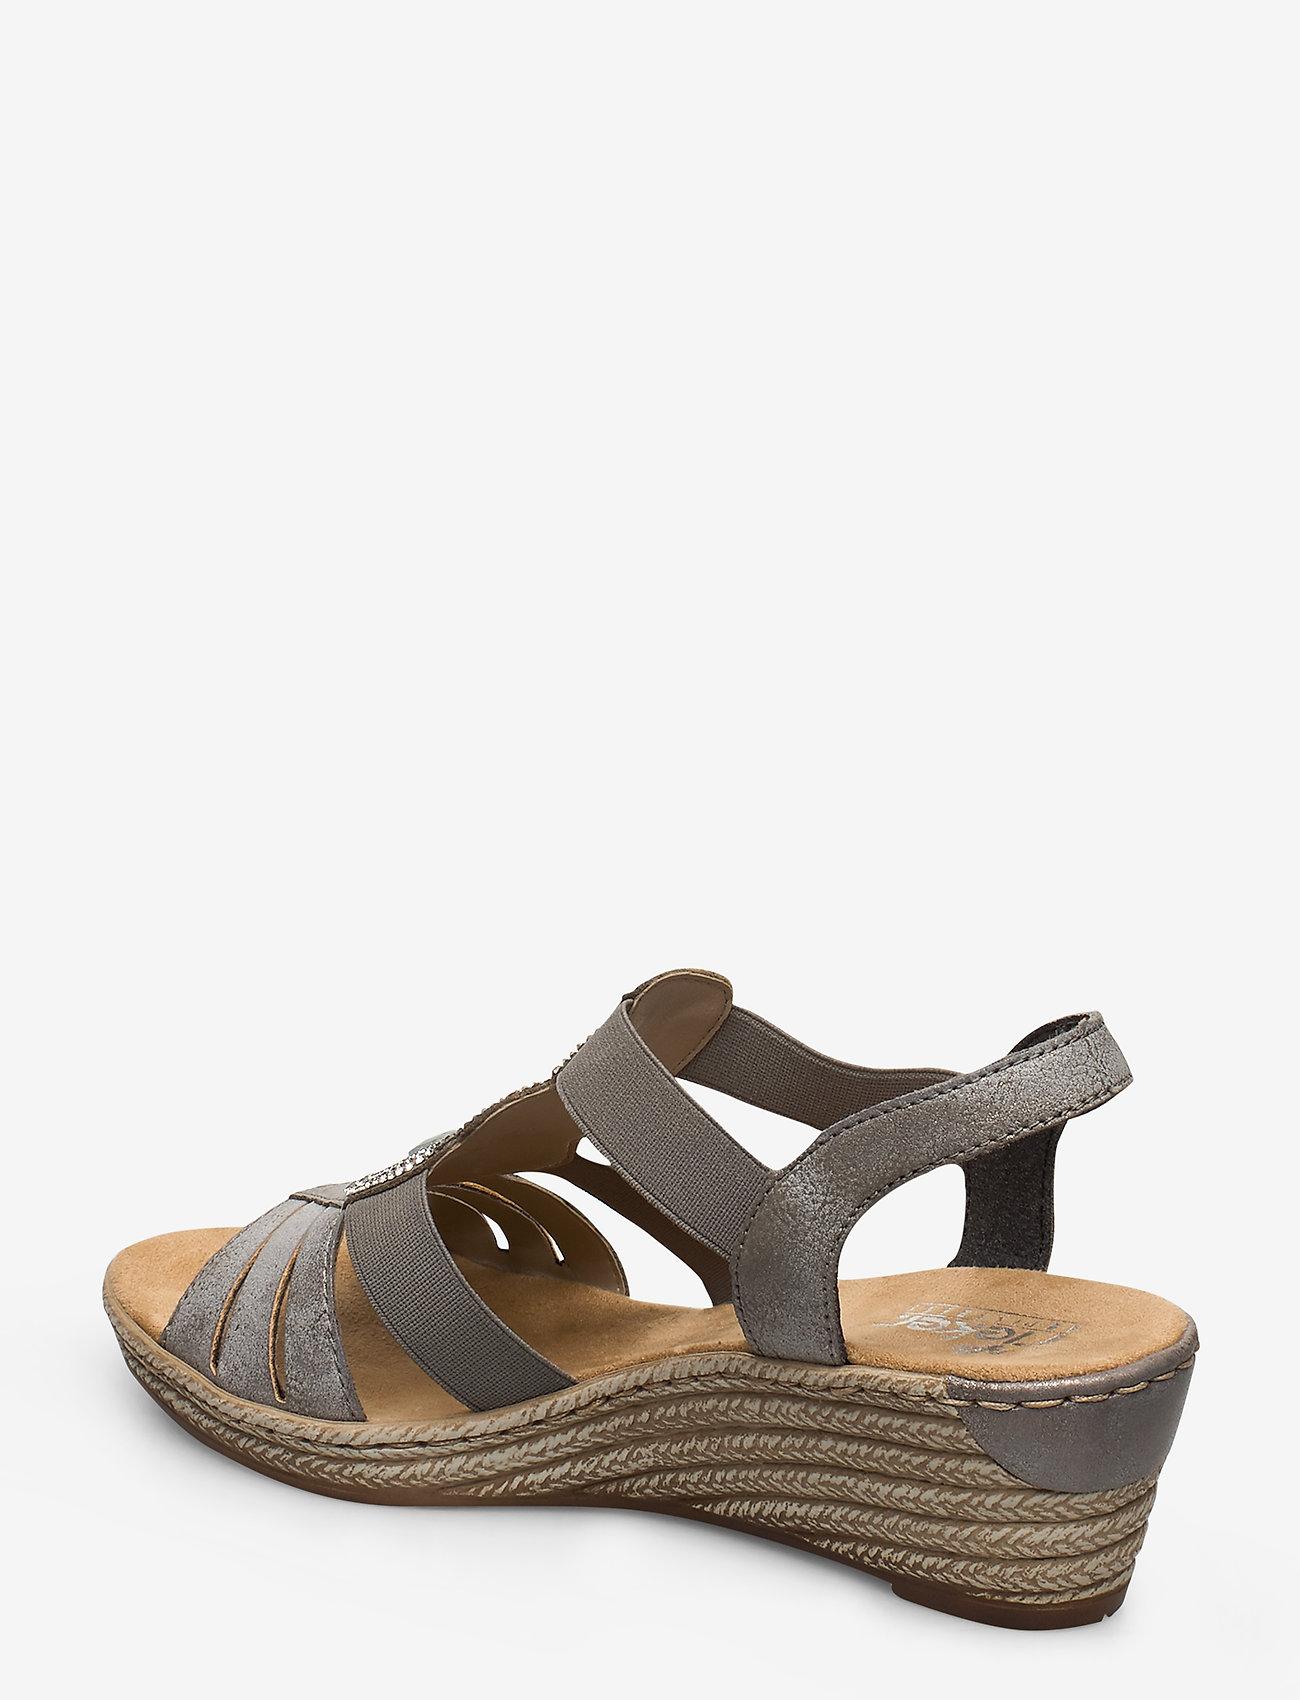 62459-00 (Grey) (299.40 kr) - Rieker